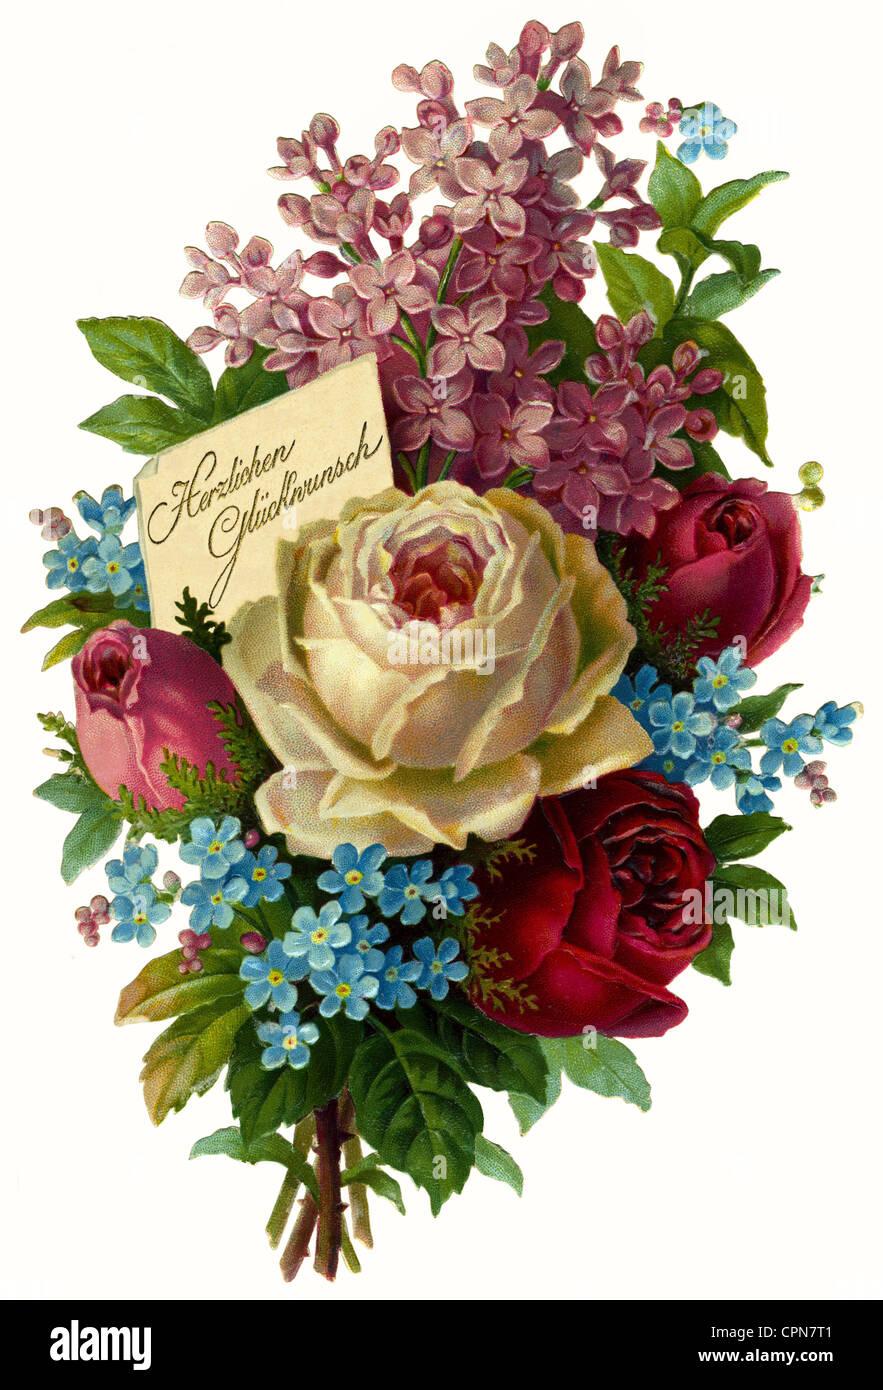 kitsch/cards/souvenir, flower bouquet, 'Herzlichen Glueckwunsch' (Congratulations), scrap-picture, Germany, - Stock Image